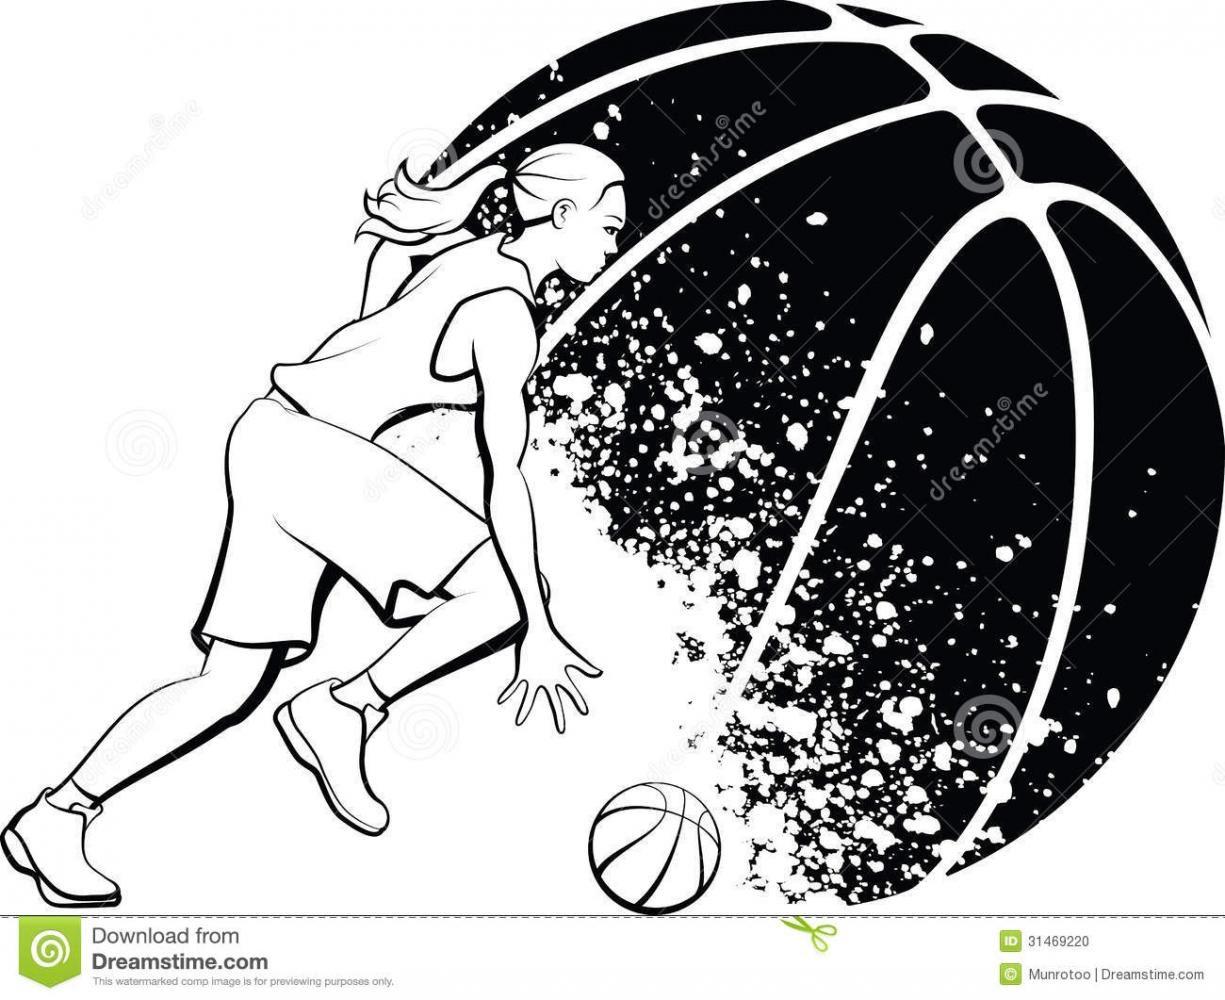 High+school+Athletes